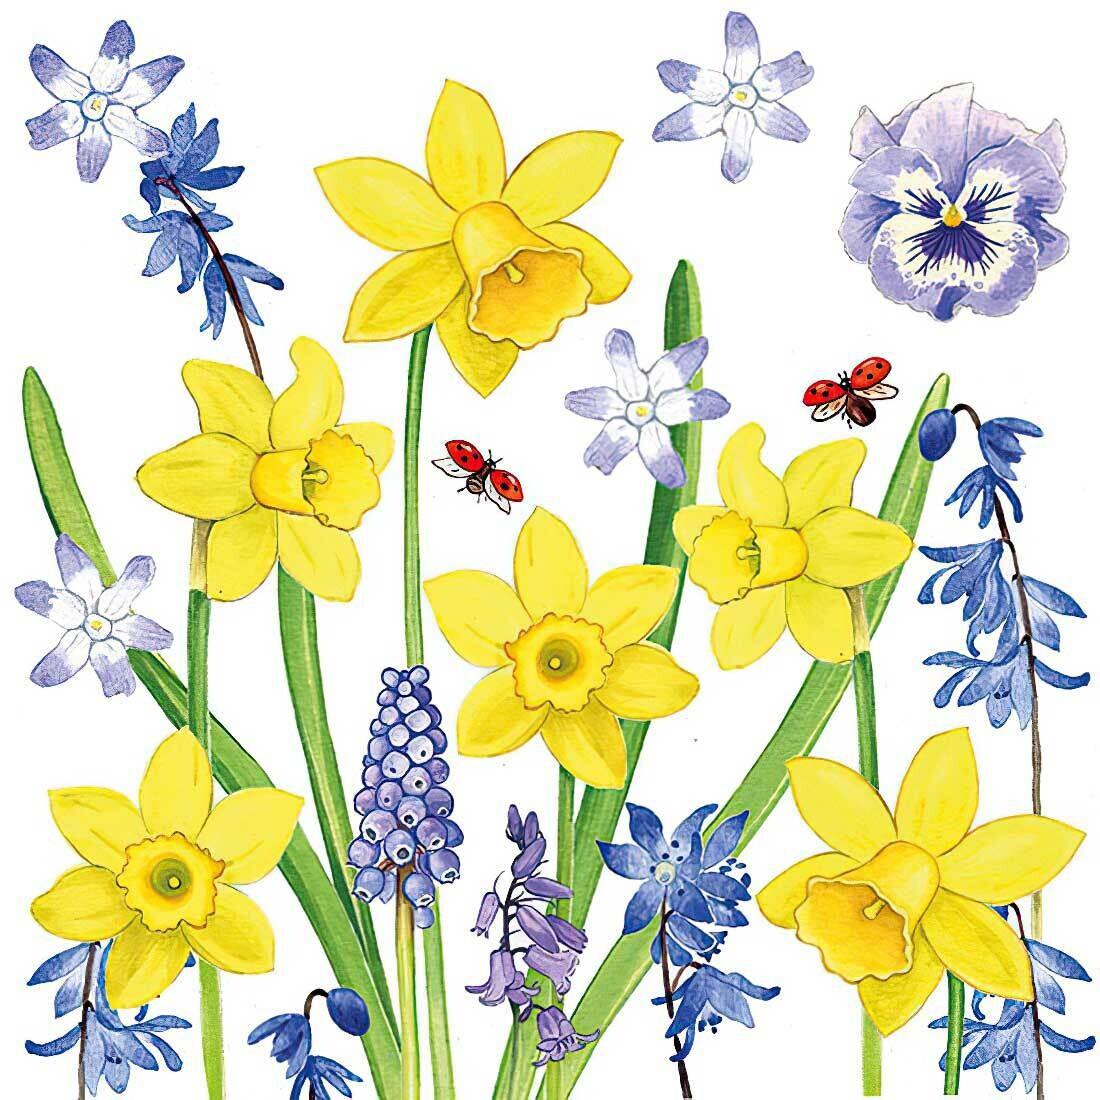 Decoupage Paper Napkins - Floral - Narcissus Love (1 Sheet)